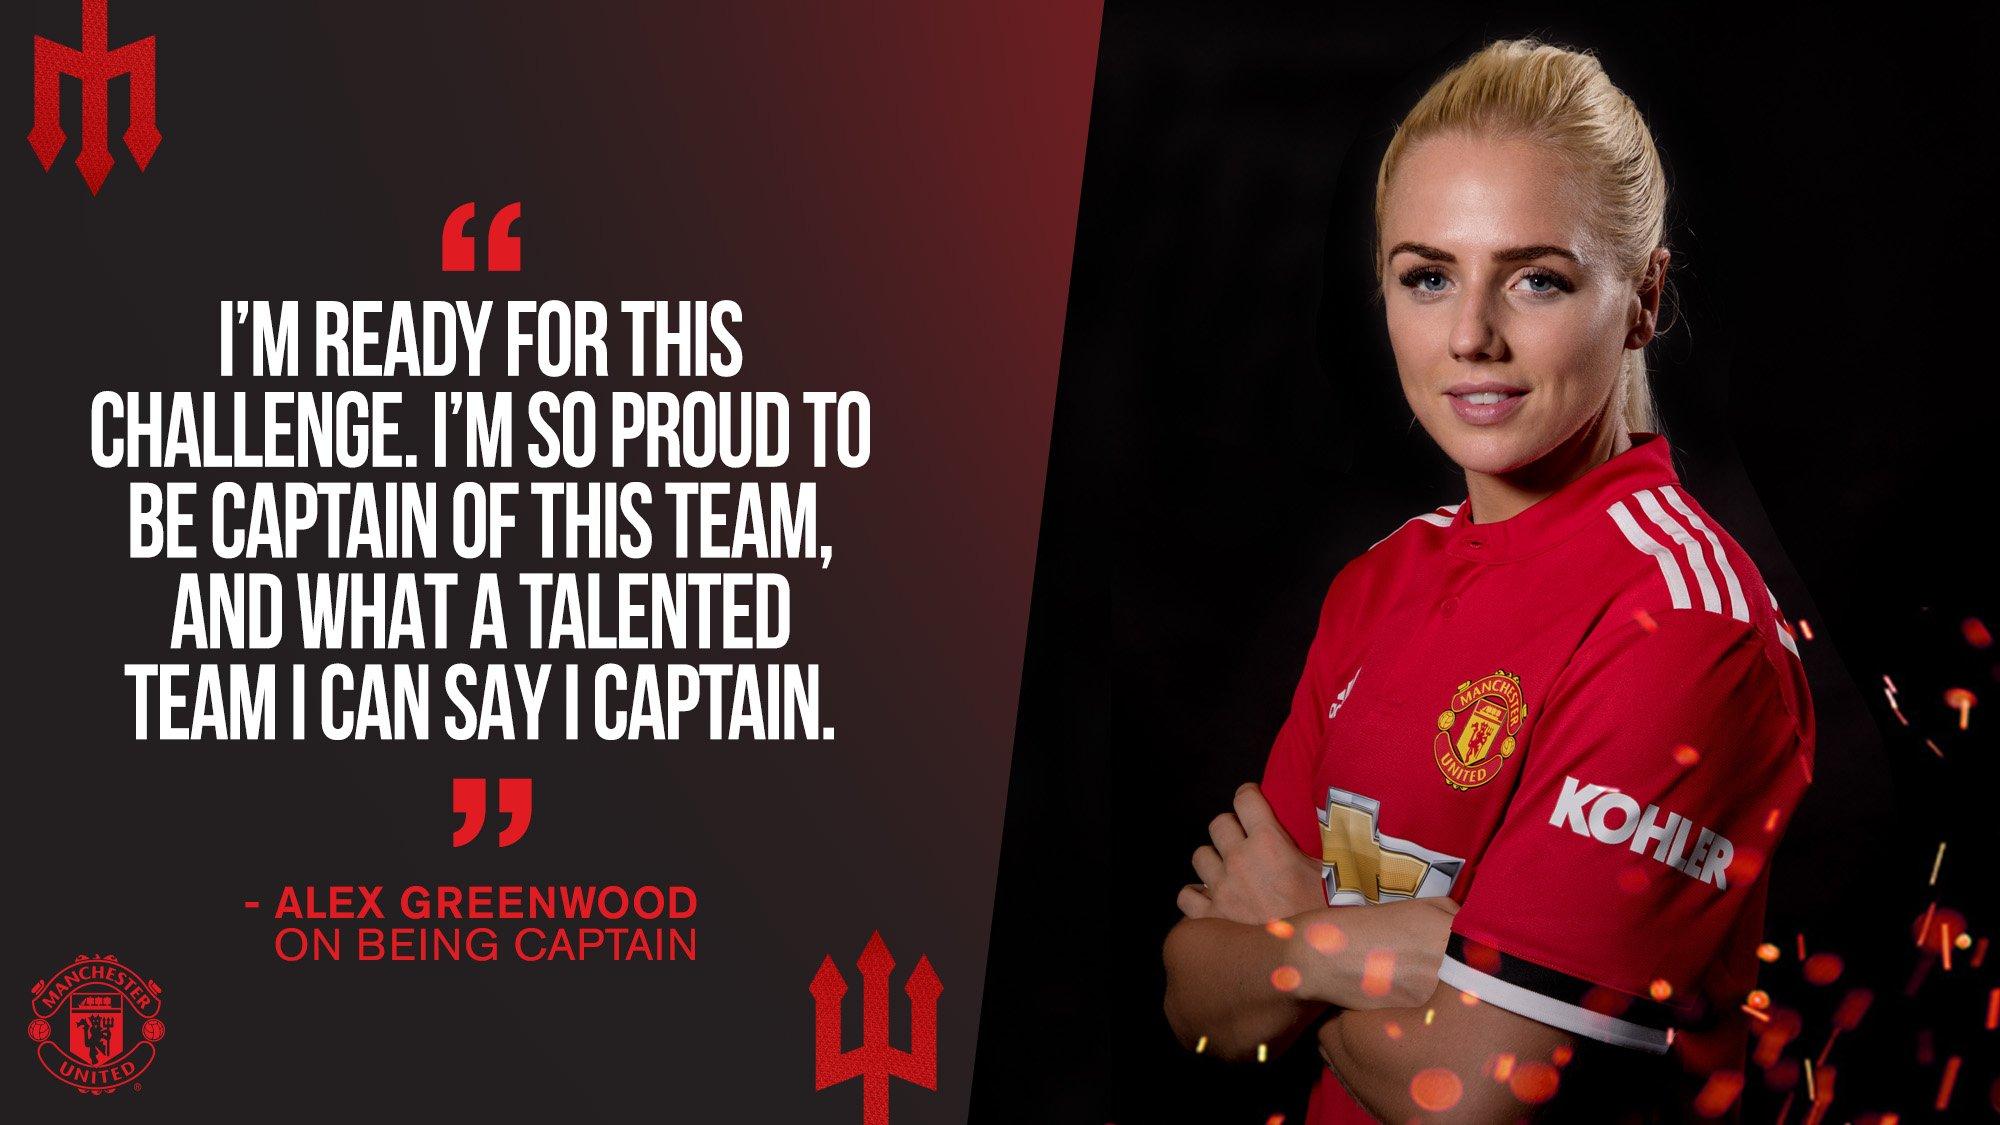 #MUWomen captain @AlexGreenwood can't wait to get going. �� #MUFC https://t.co/6ijeB1RT2N